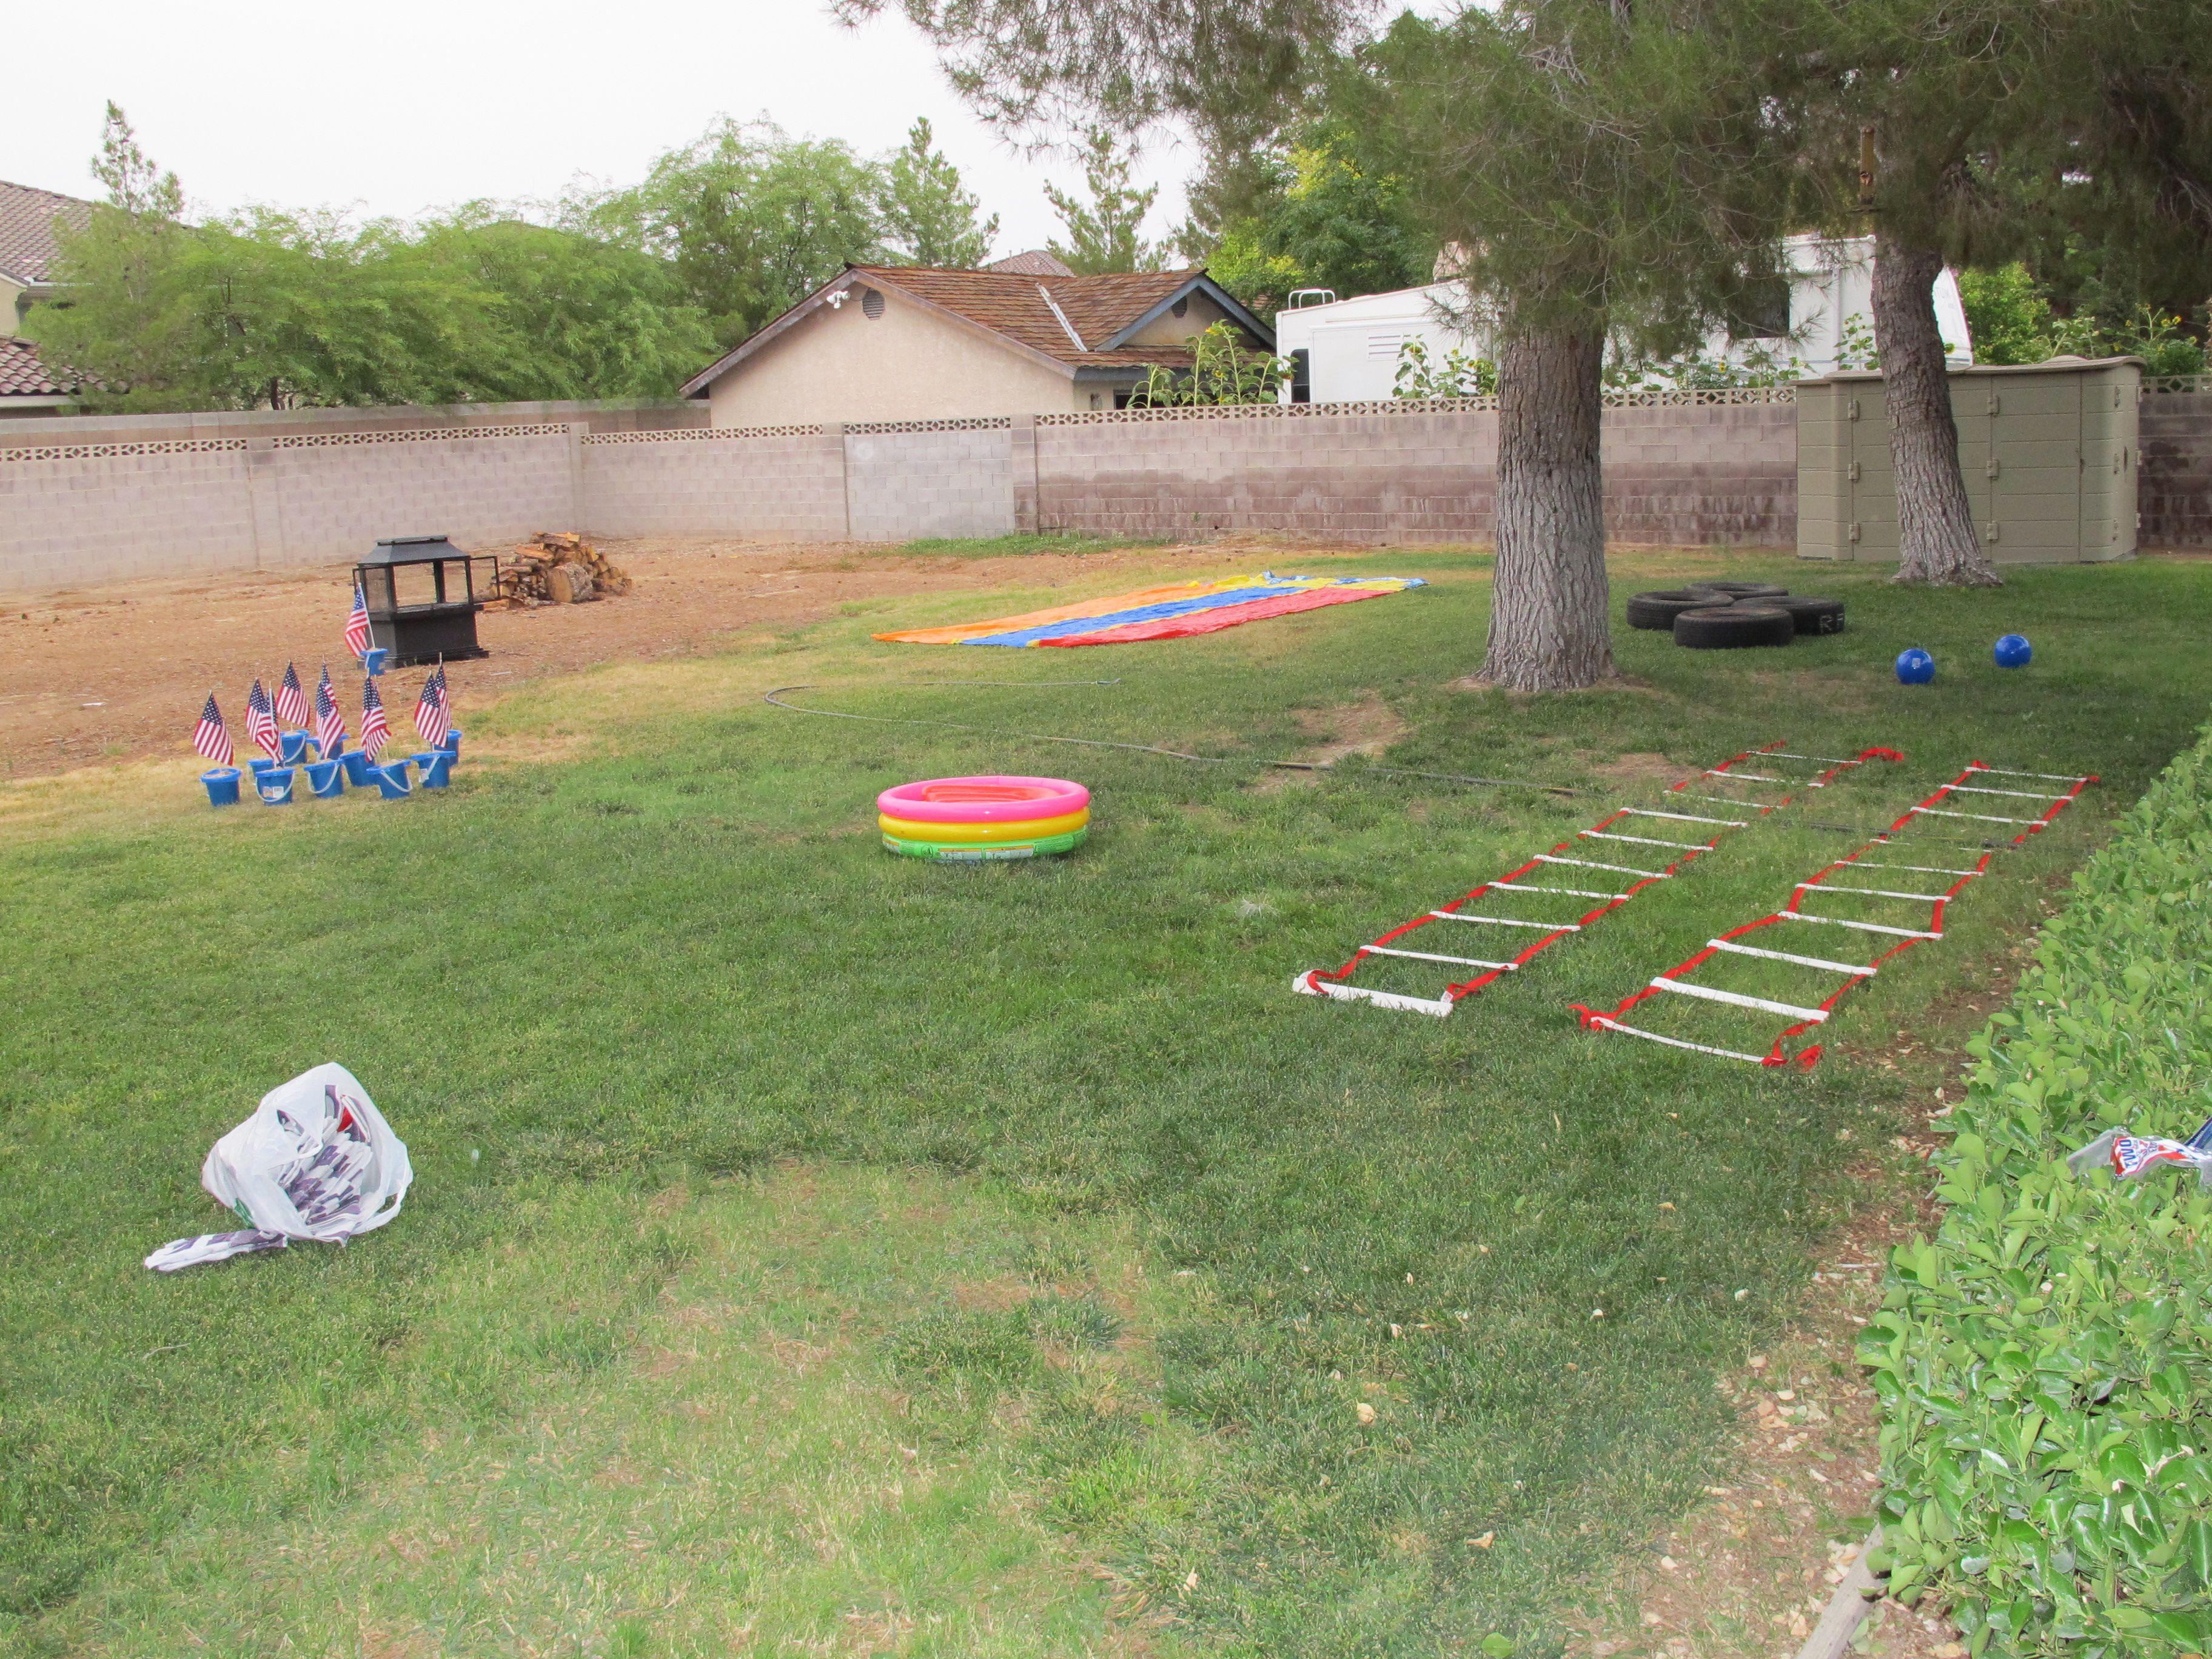 Relay race idea- ball between the legs, tires, agility ladder criss-cross, crab walk, hula hoop hop, sand bucket zig-zag, and slip n slide to finish it off!